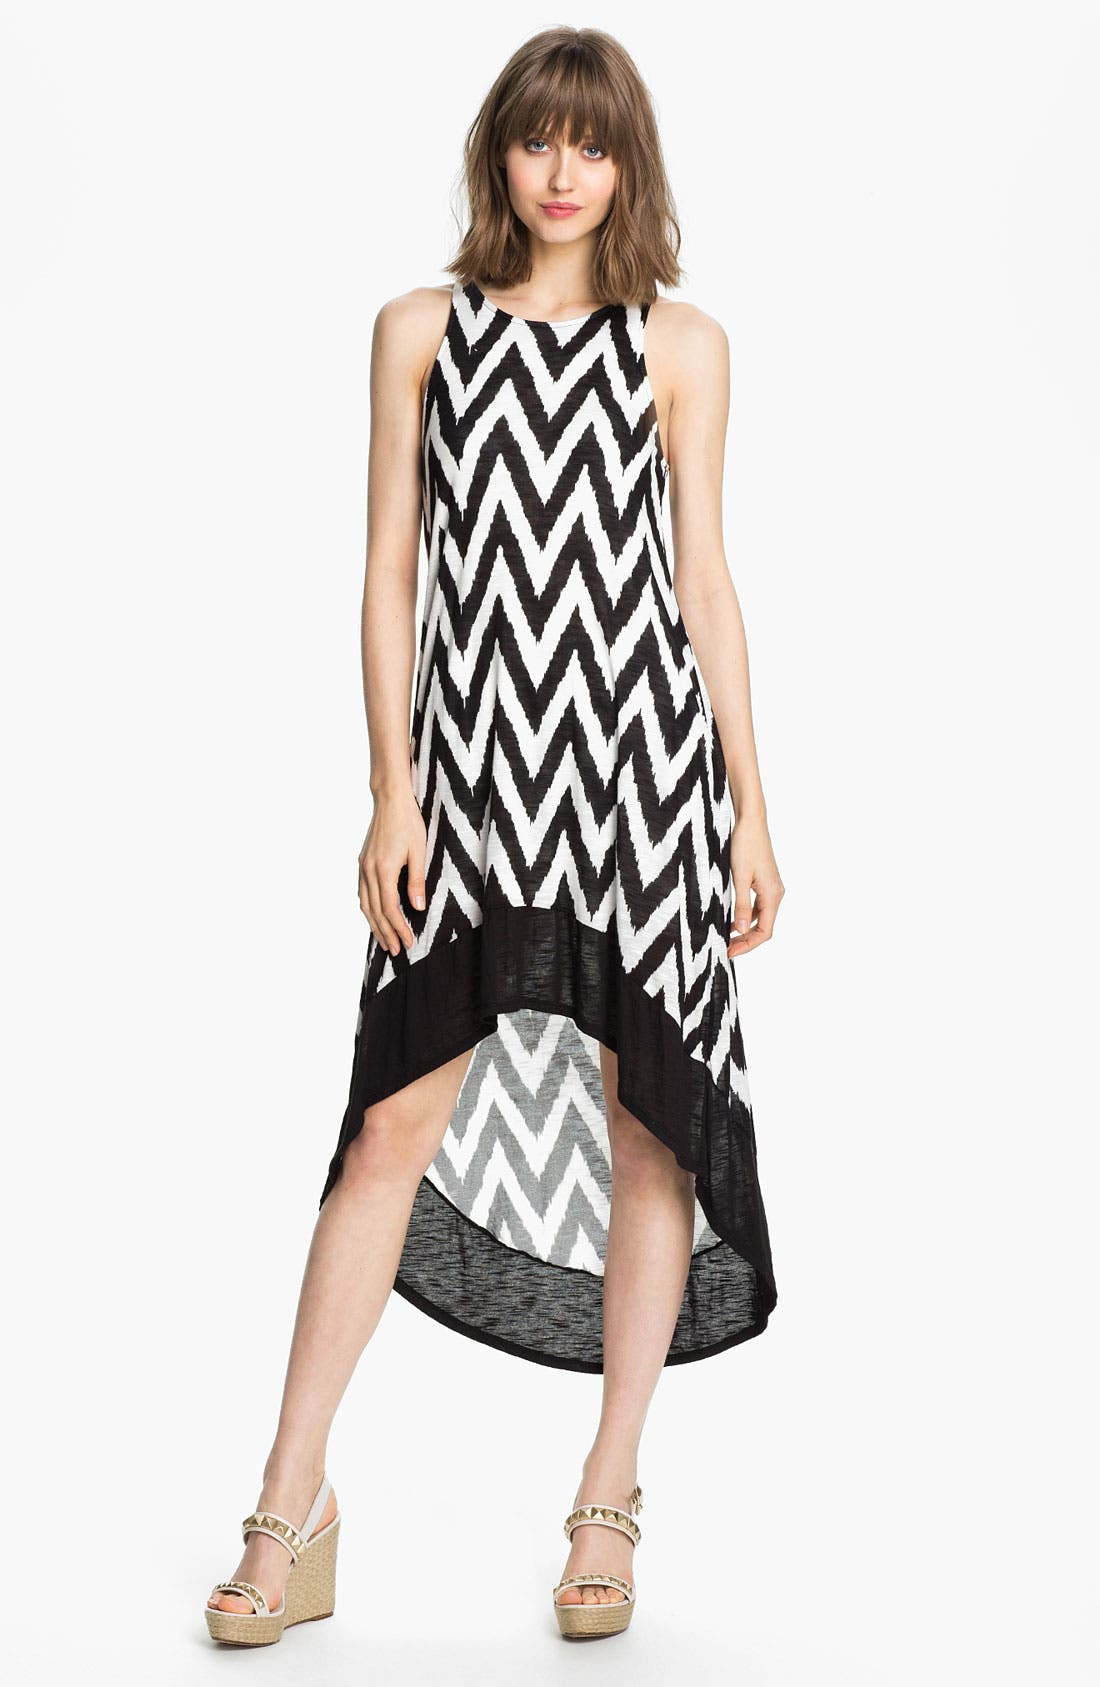 Main Image - Ella Moss 'Mazzy' Zigzag Print High/Low Dress